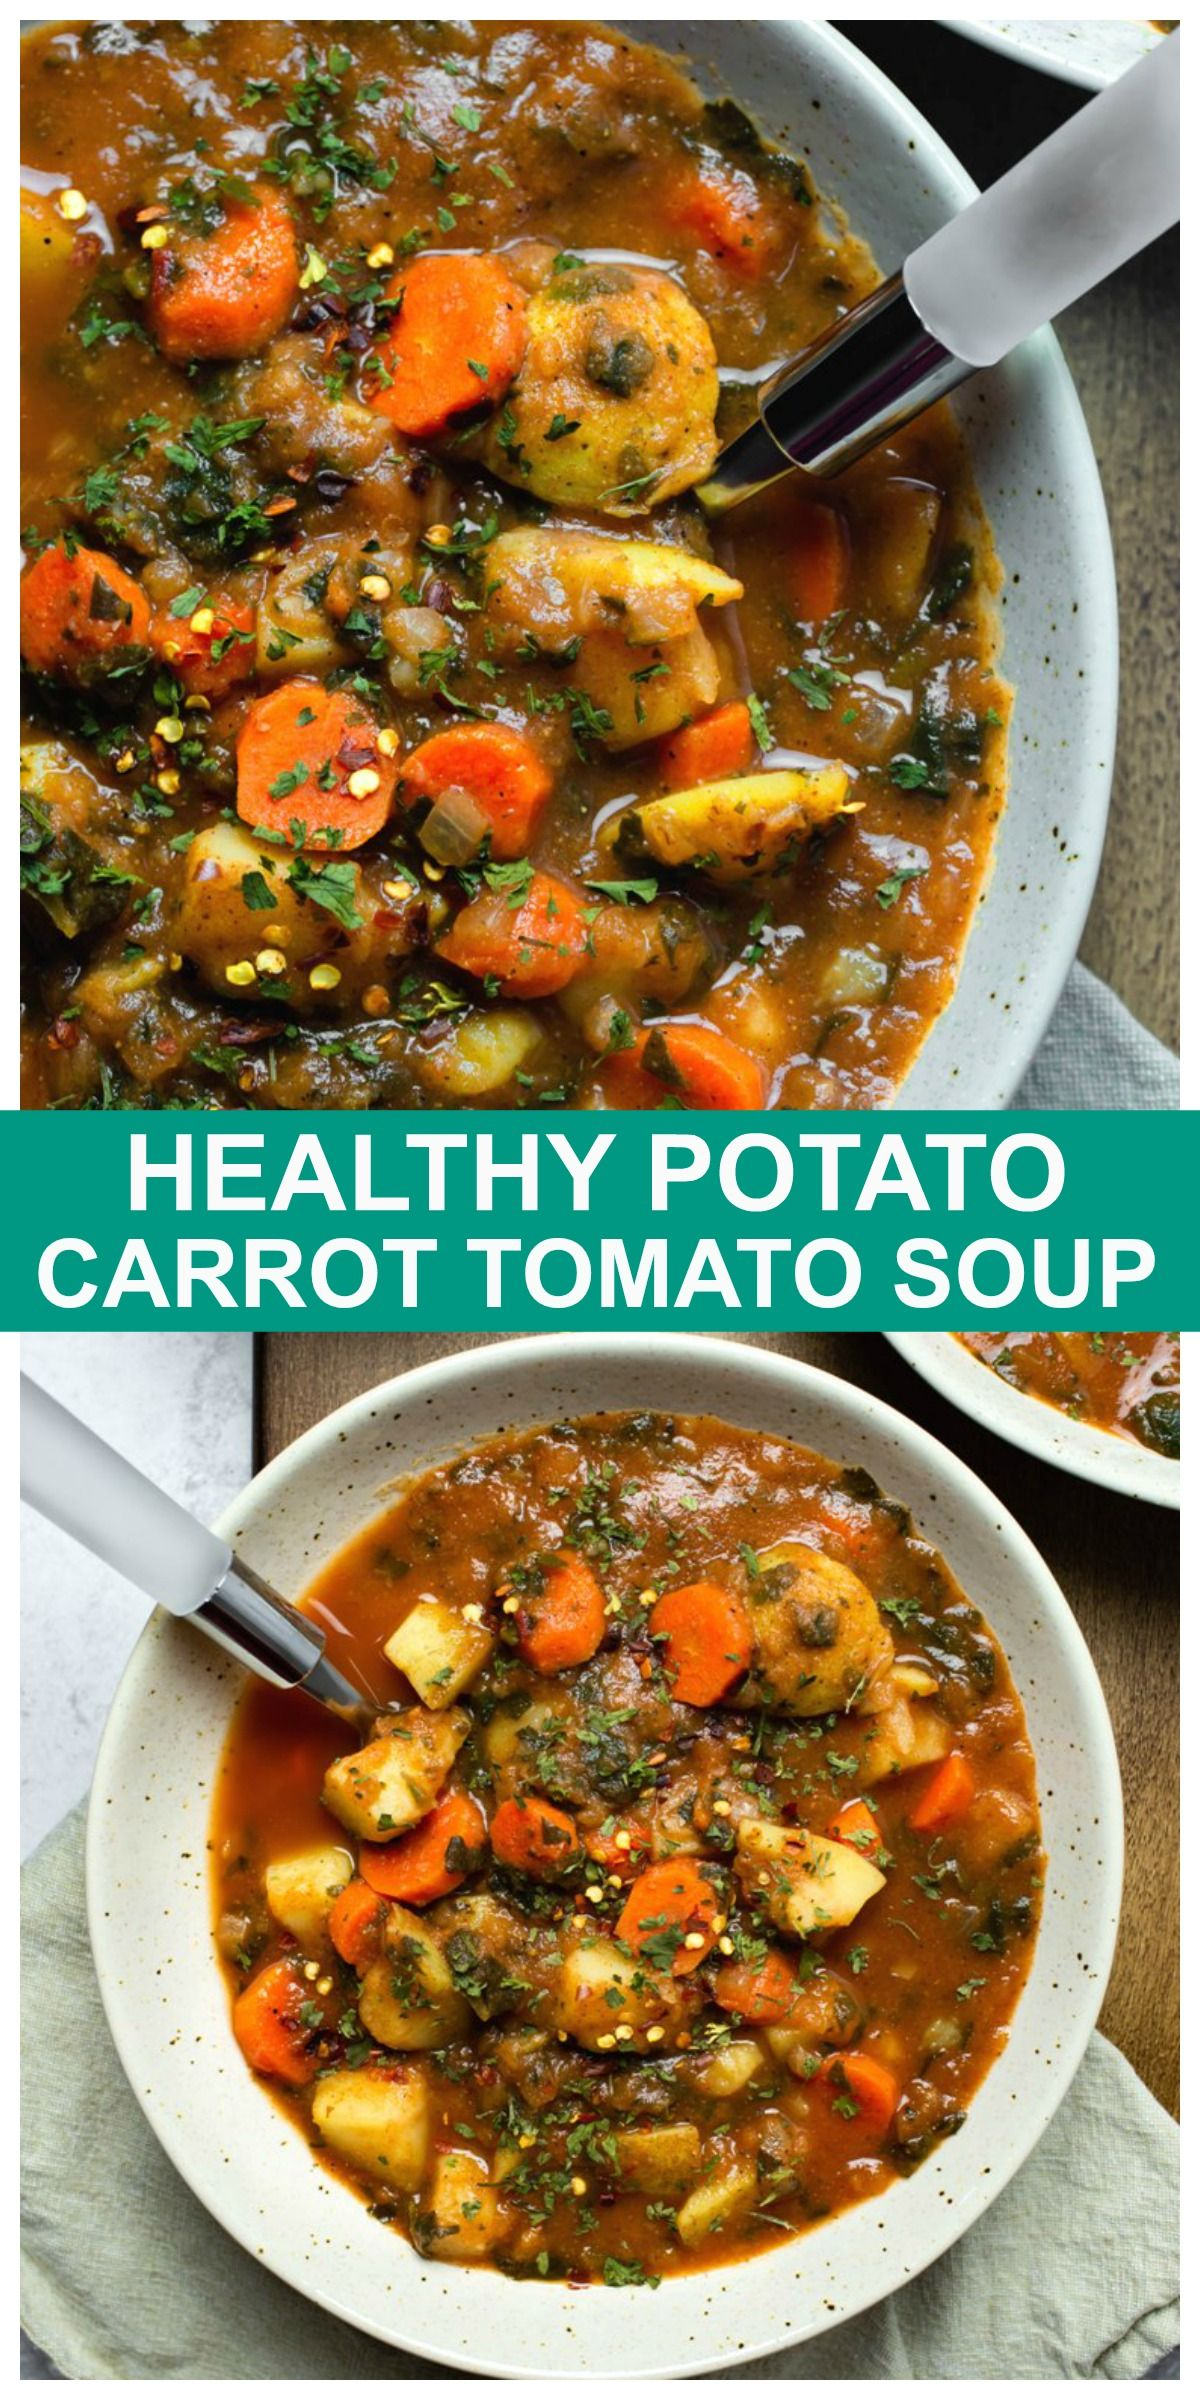 Healthy Potato Carrot Tomato Soup Recipe In 2020 Vegan Soup Recipes Healthy Soup Recipes Vegan Recipes Healthy